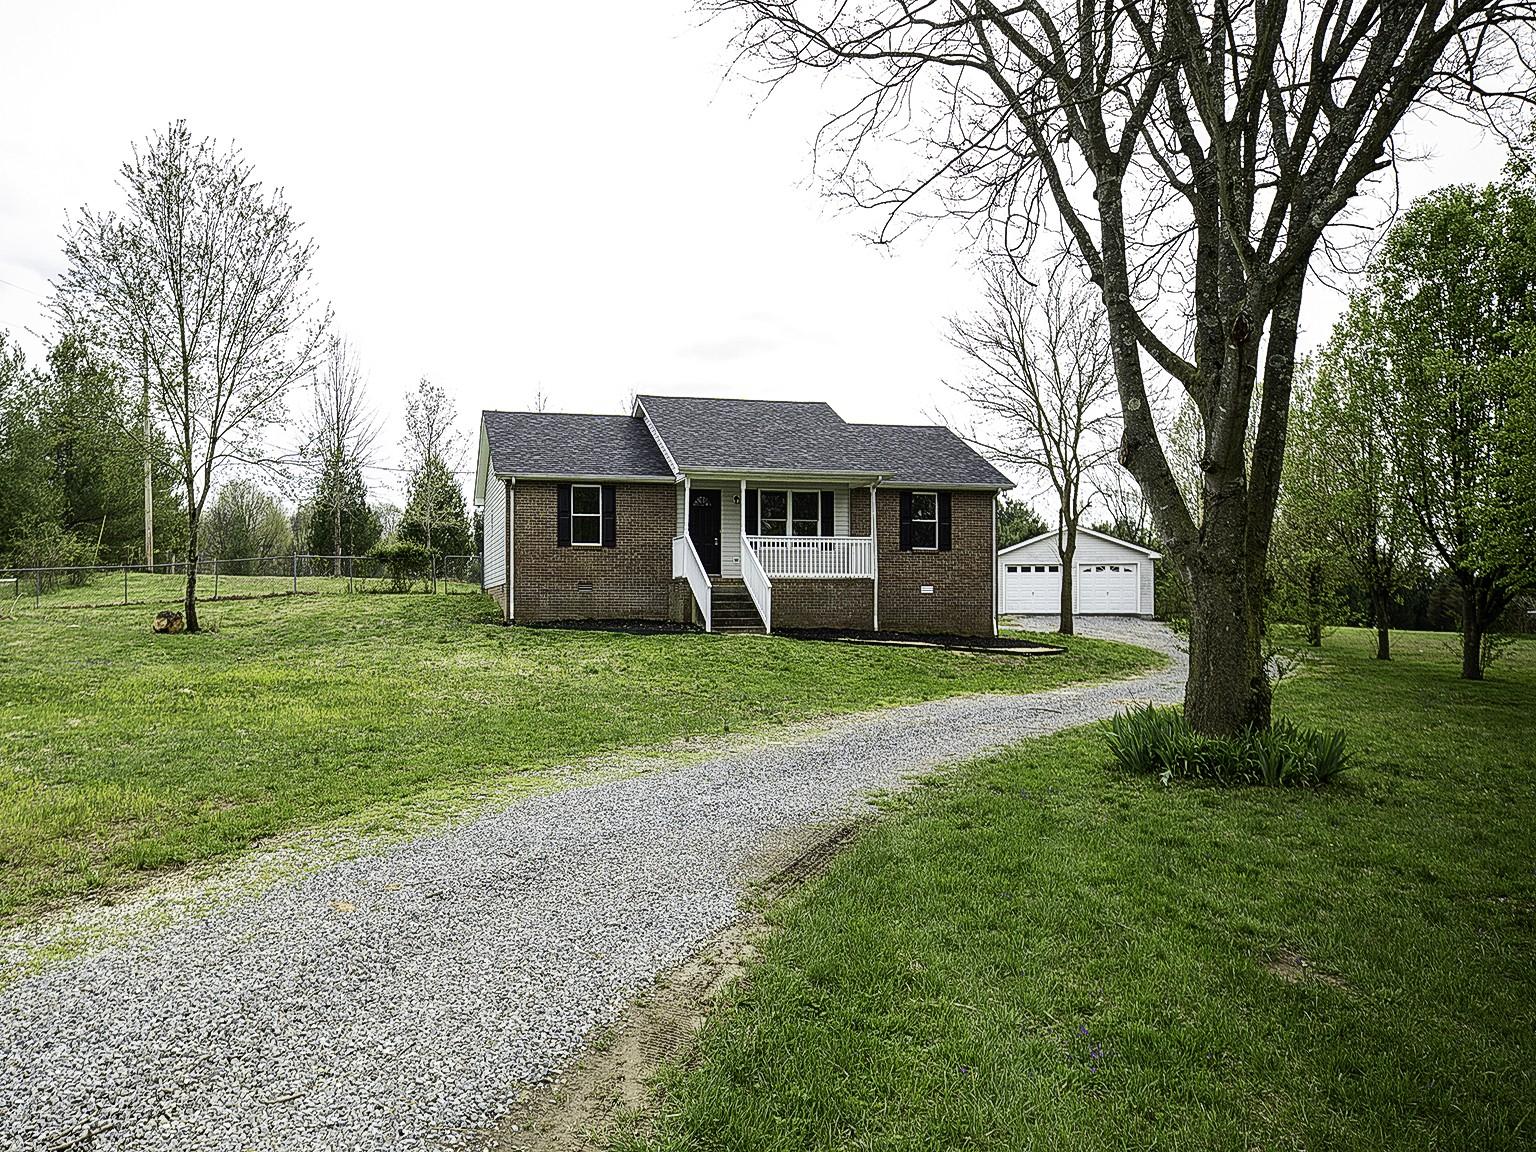 4021 Fykes Grove Rd, Cedar Hill, TN 37032 - Cedar Hill, TN real estate listing